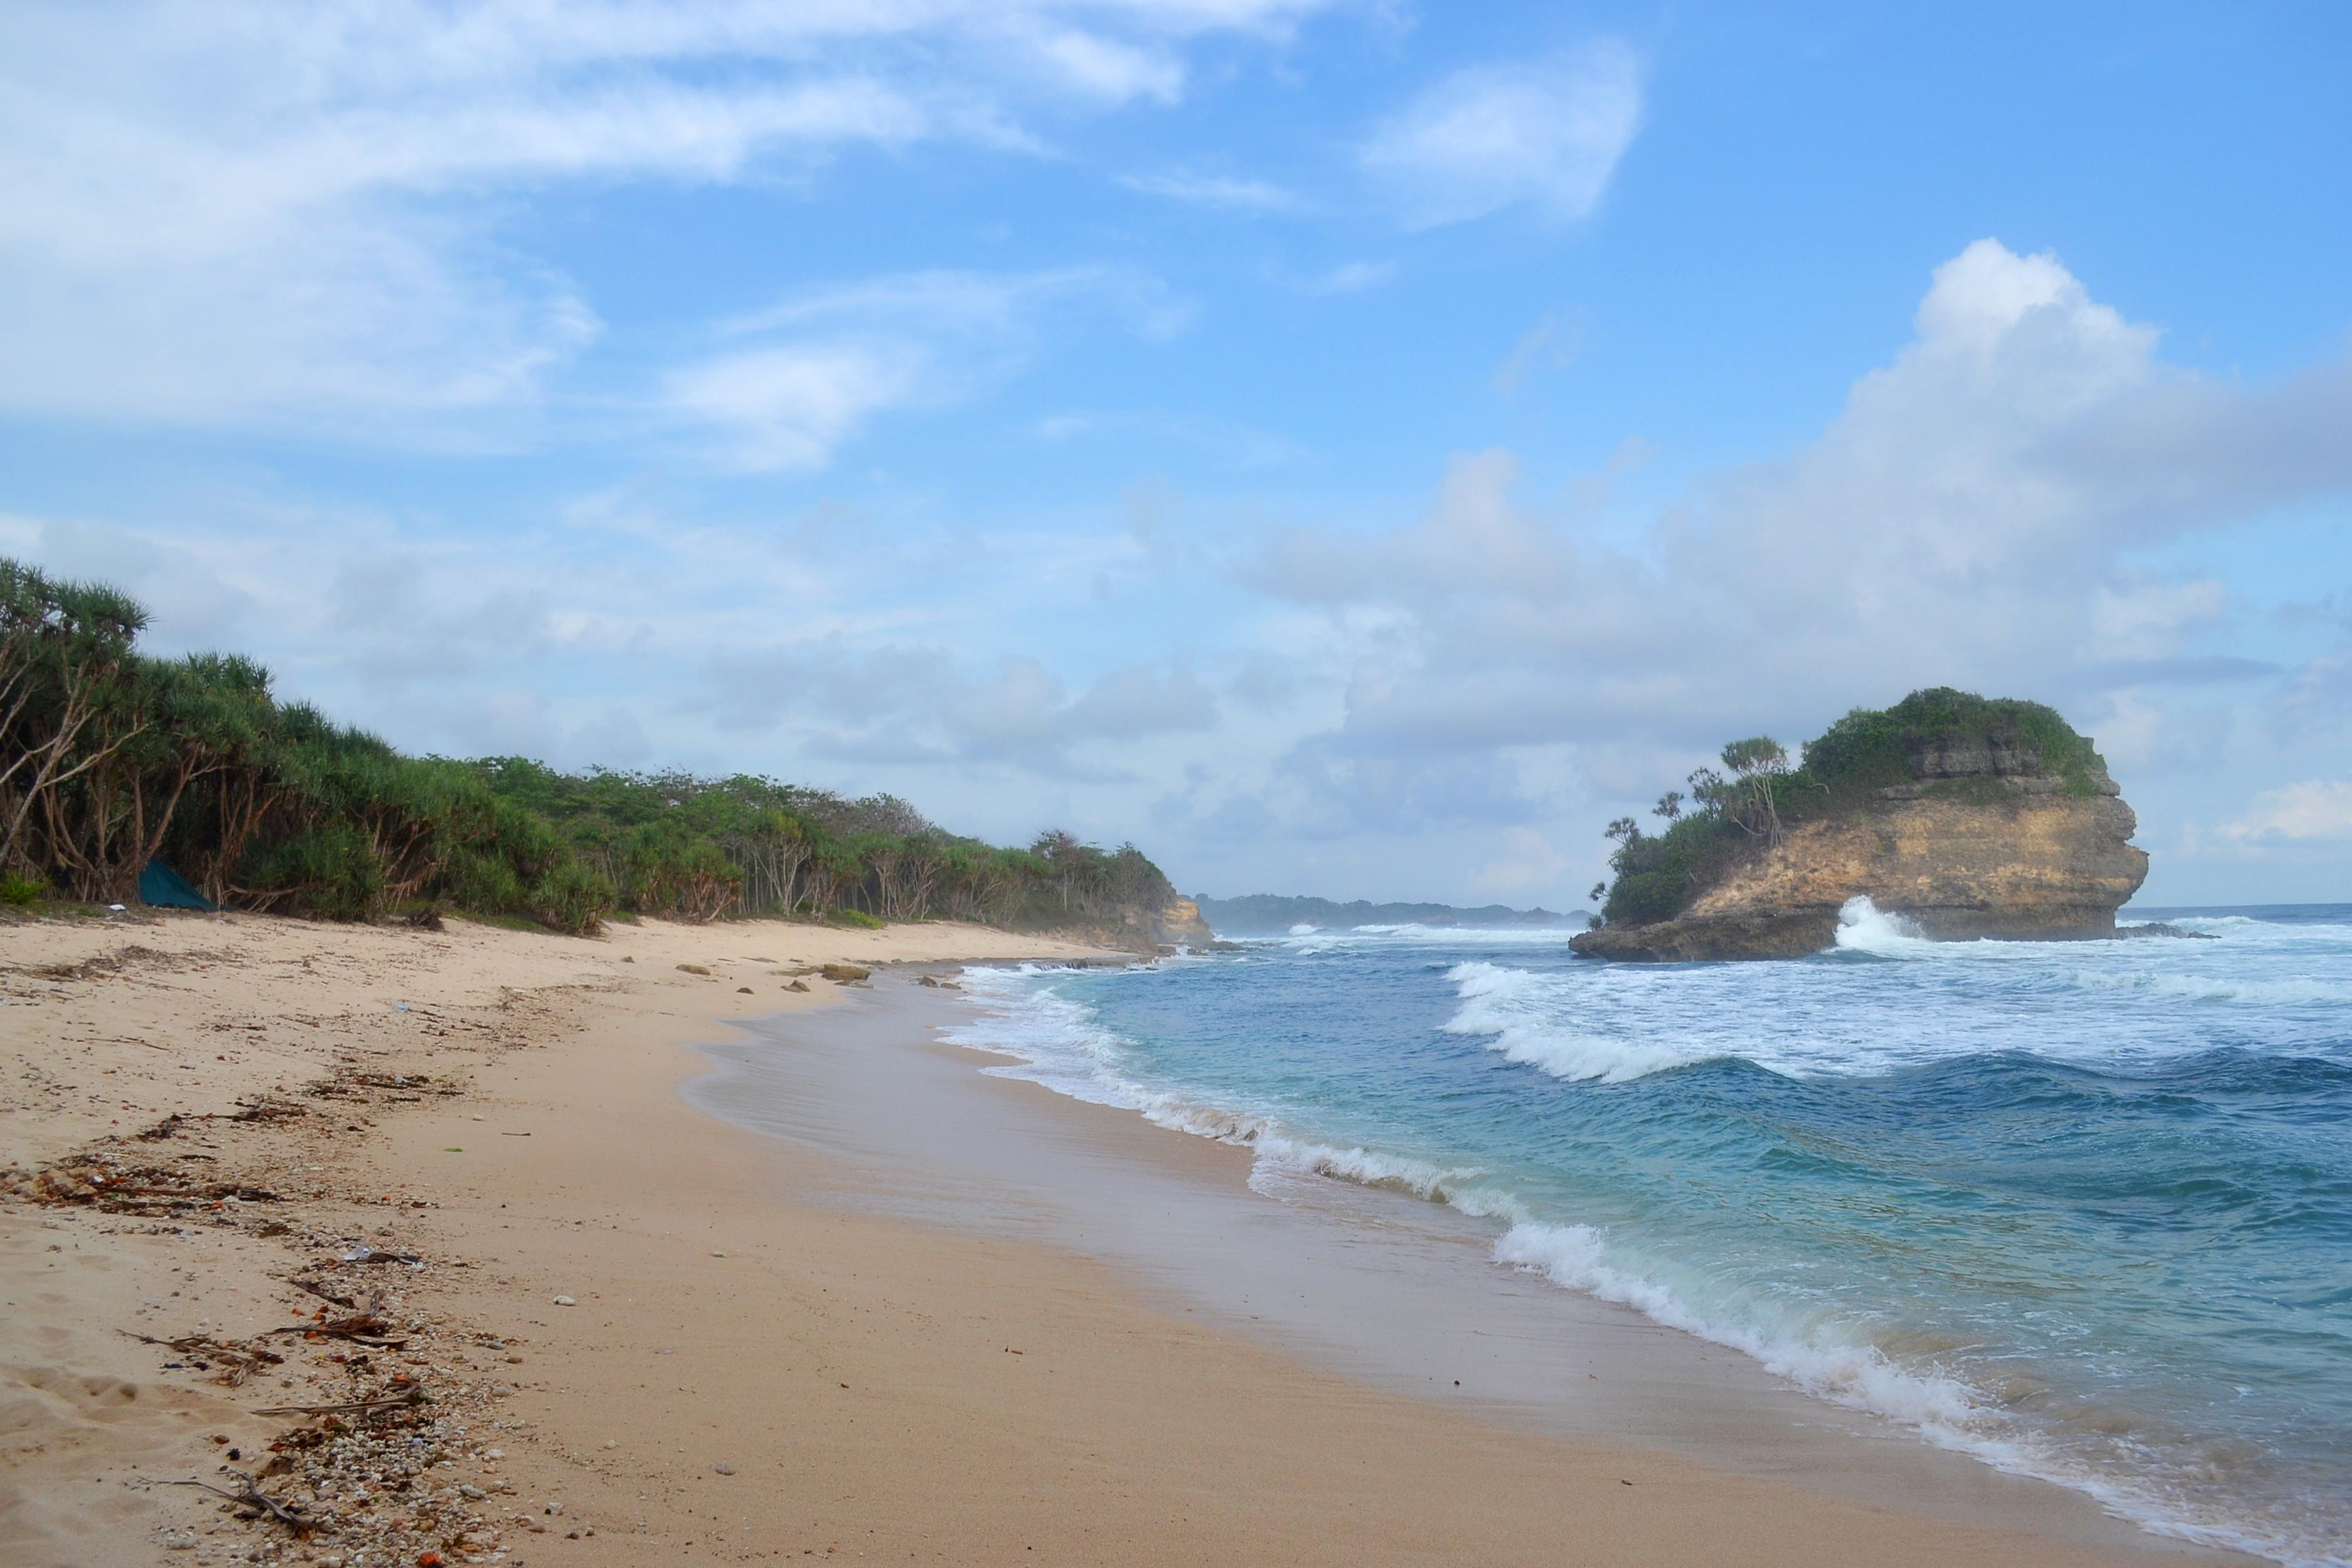 Jonggring Saloko Pantai 1001 Kesan Potensinya Terabaikan Map Dsc 0926